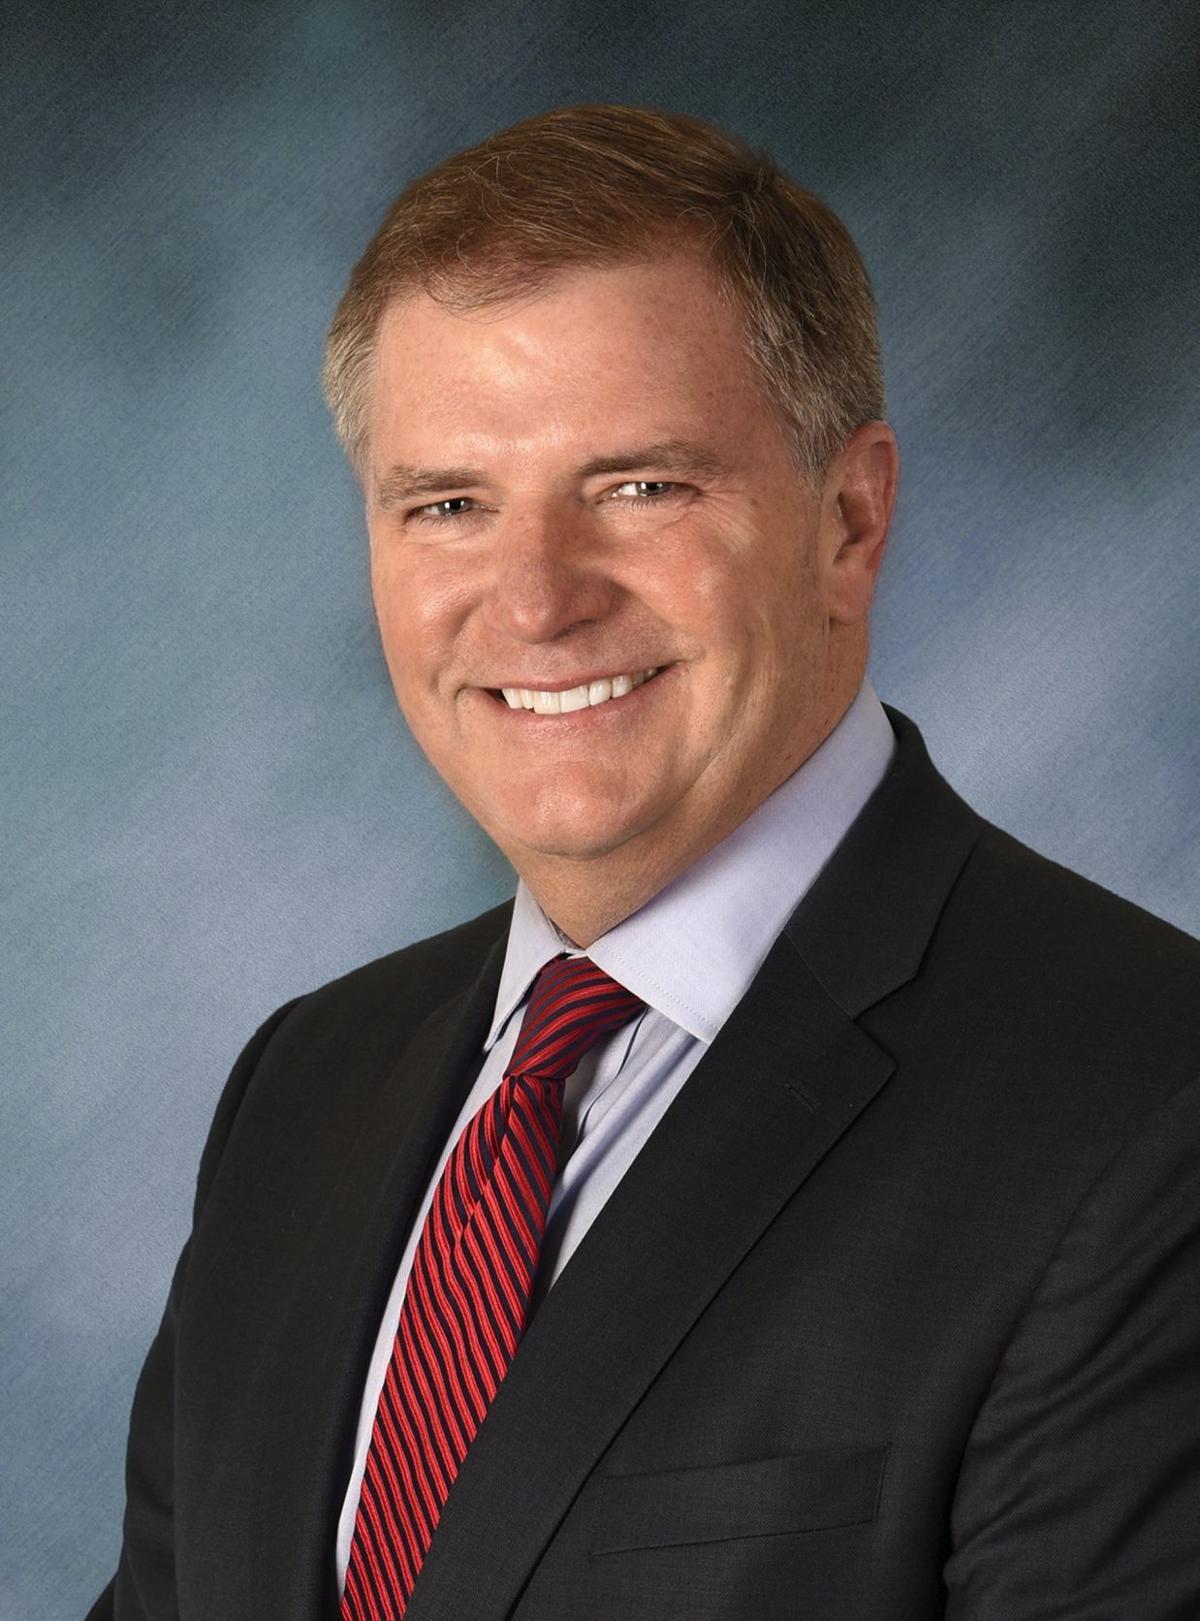 Bill Brady